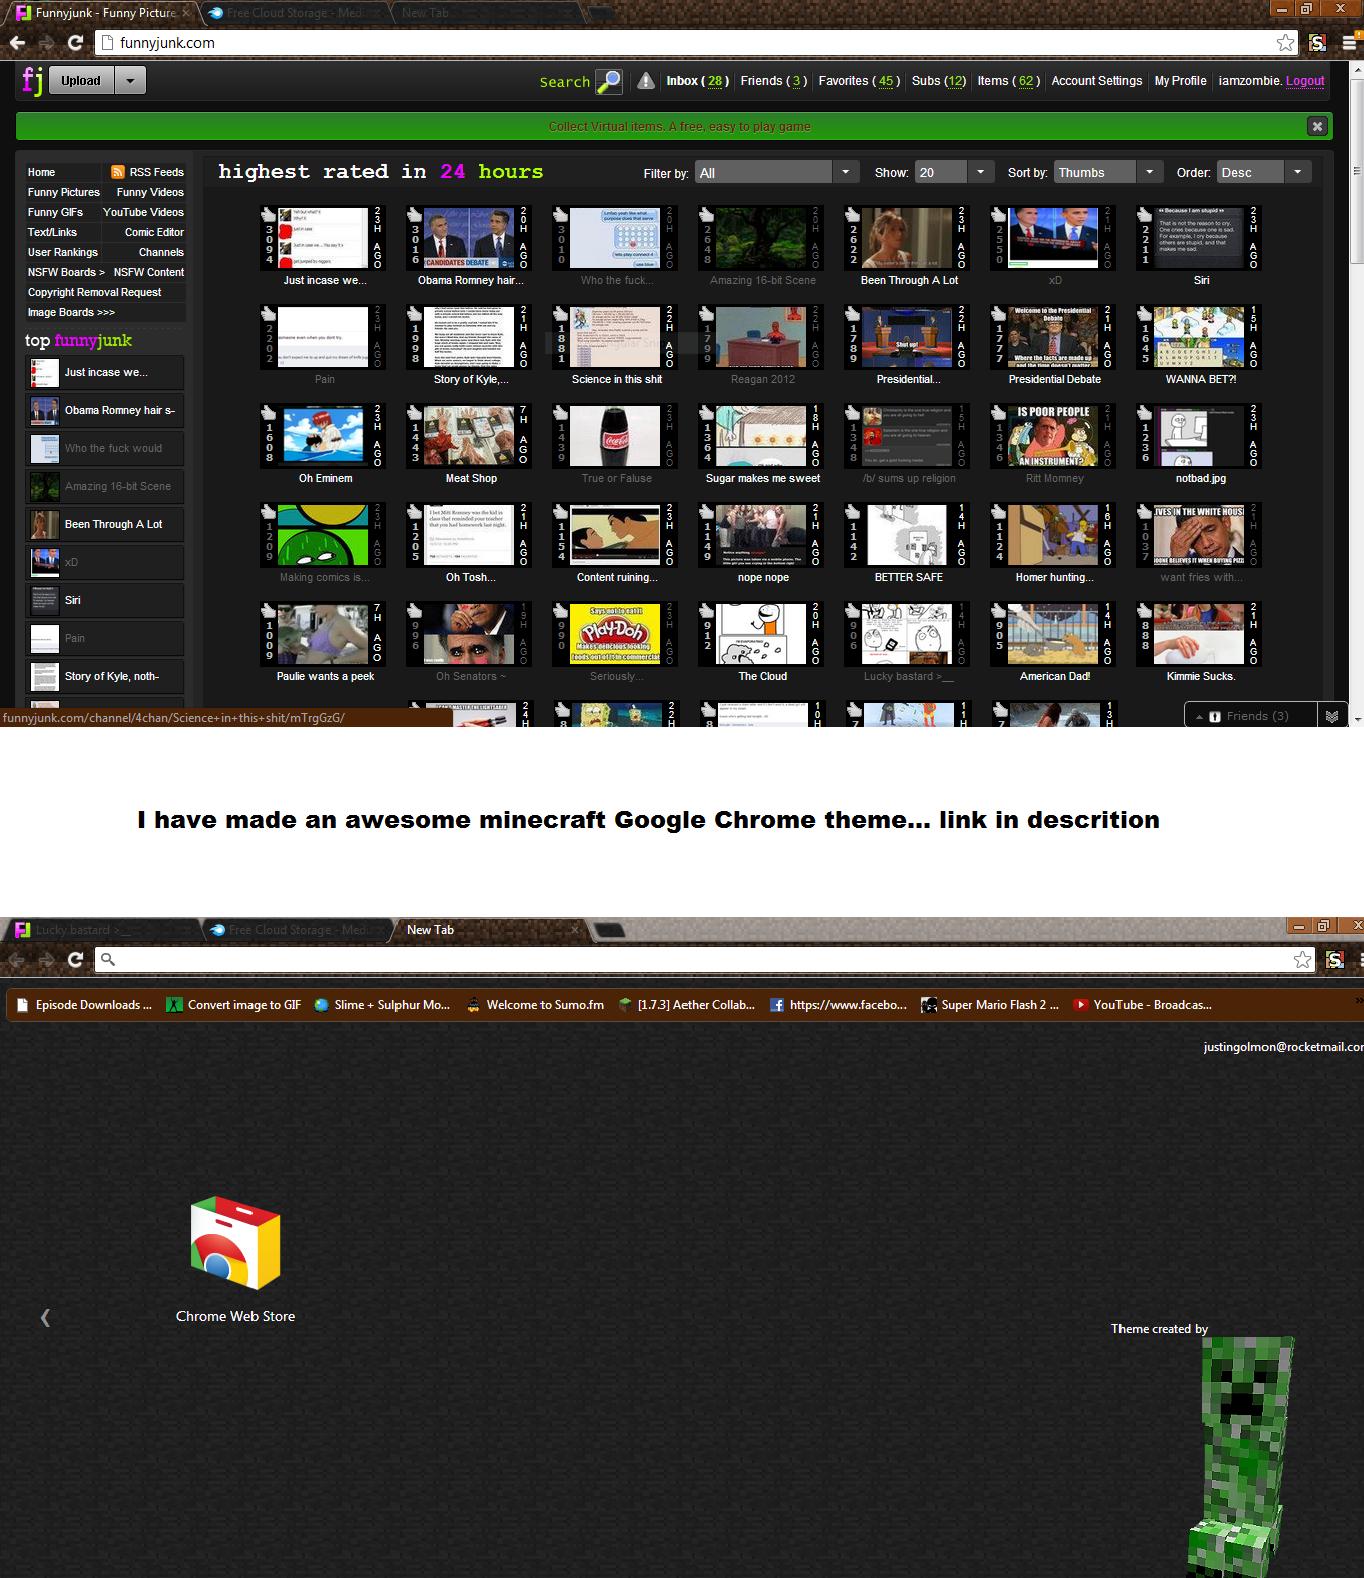 "Badass minecraft theme. mediafire.com/download.php?xbk8l8xz6k4kke8 remove space between ""kk"" and ""e8"". u Funnyjunk- Funnypart a W nkma Hum:"